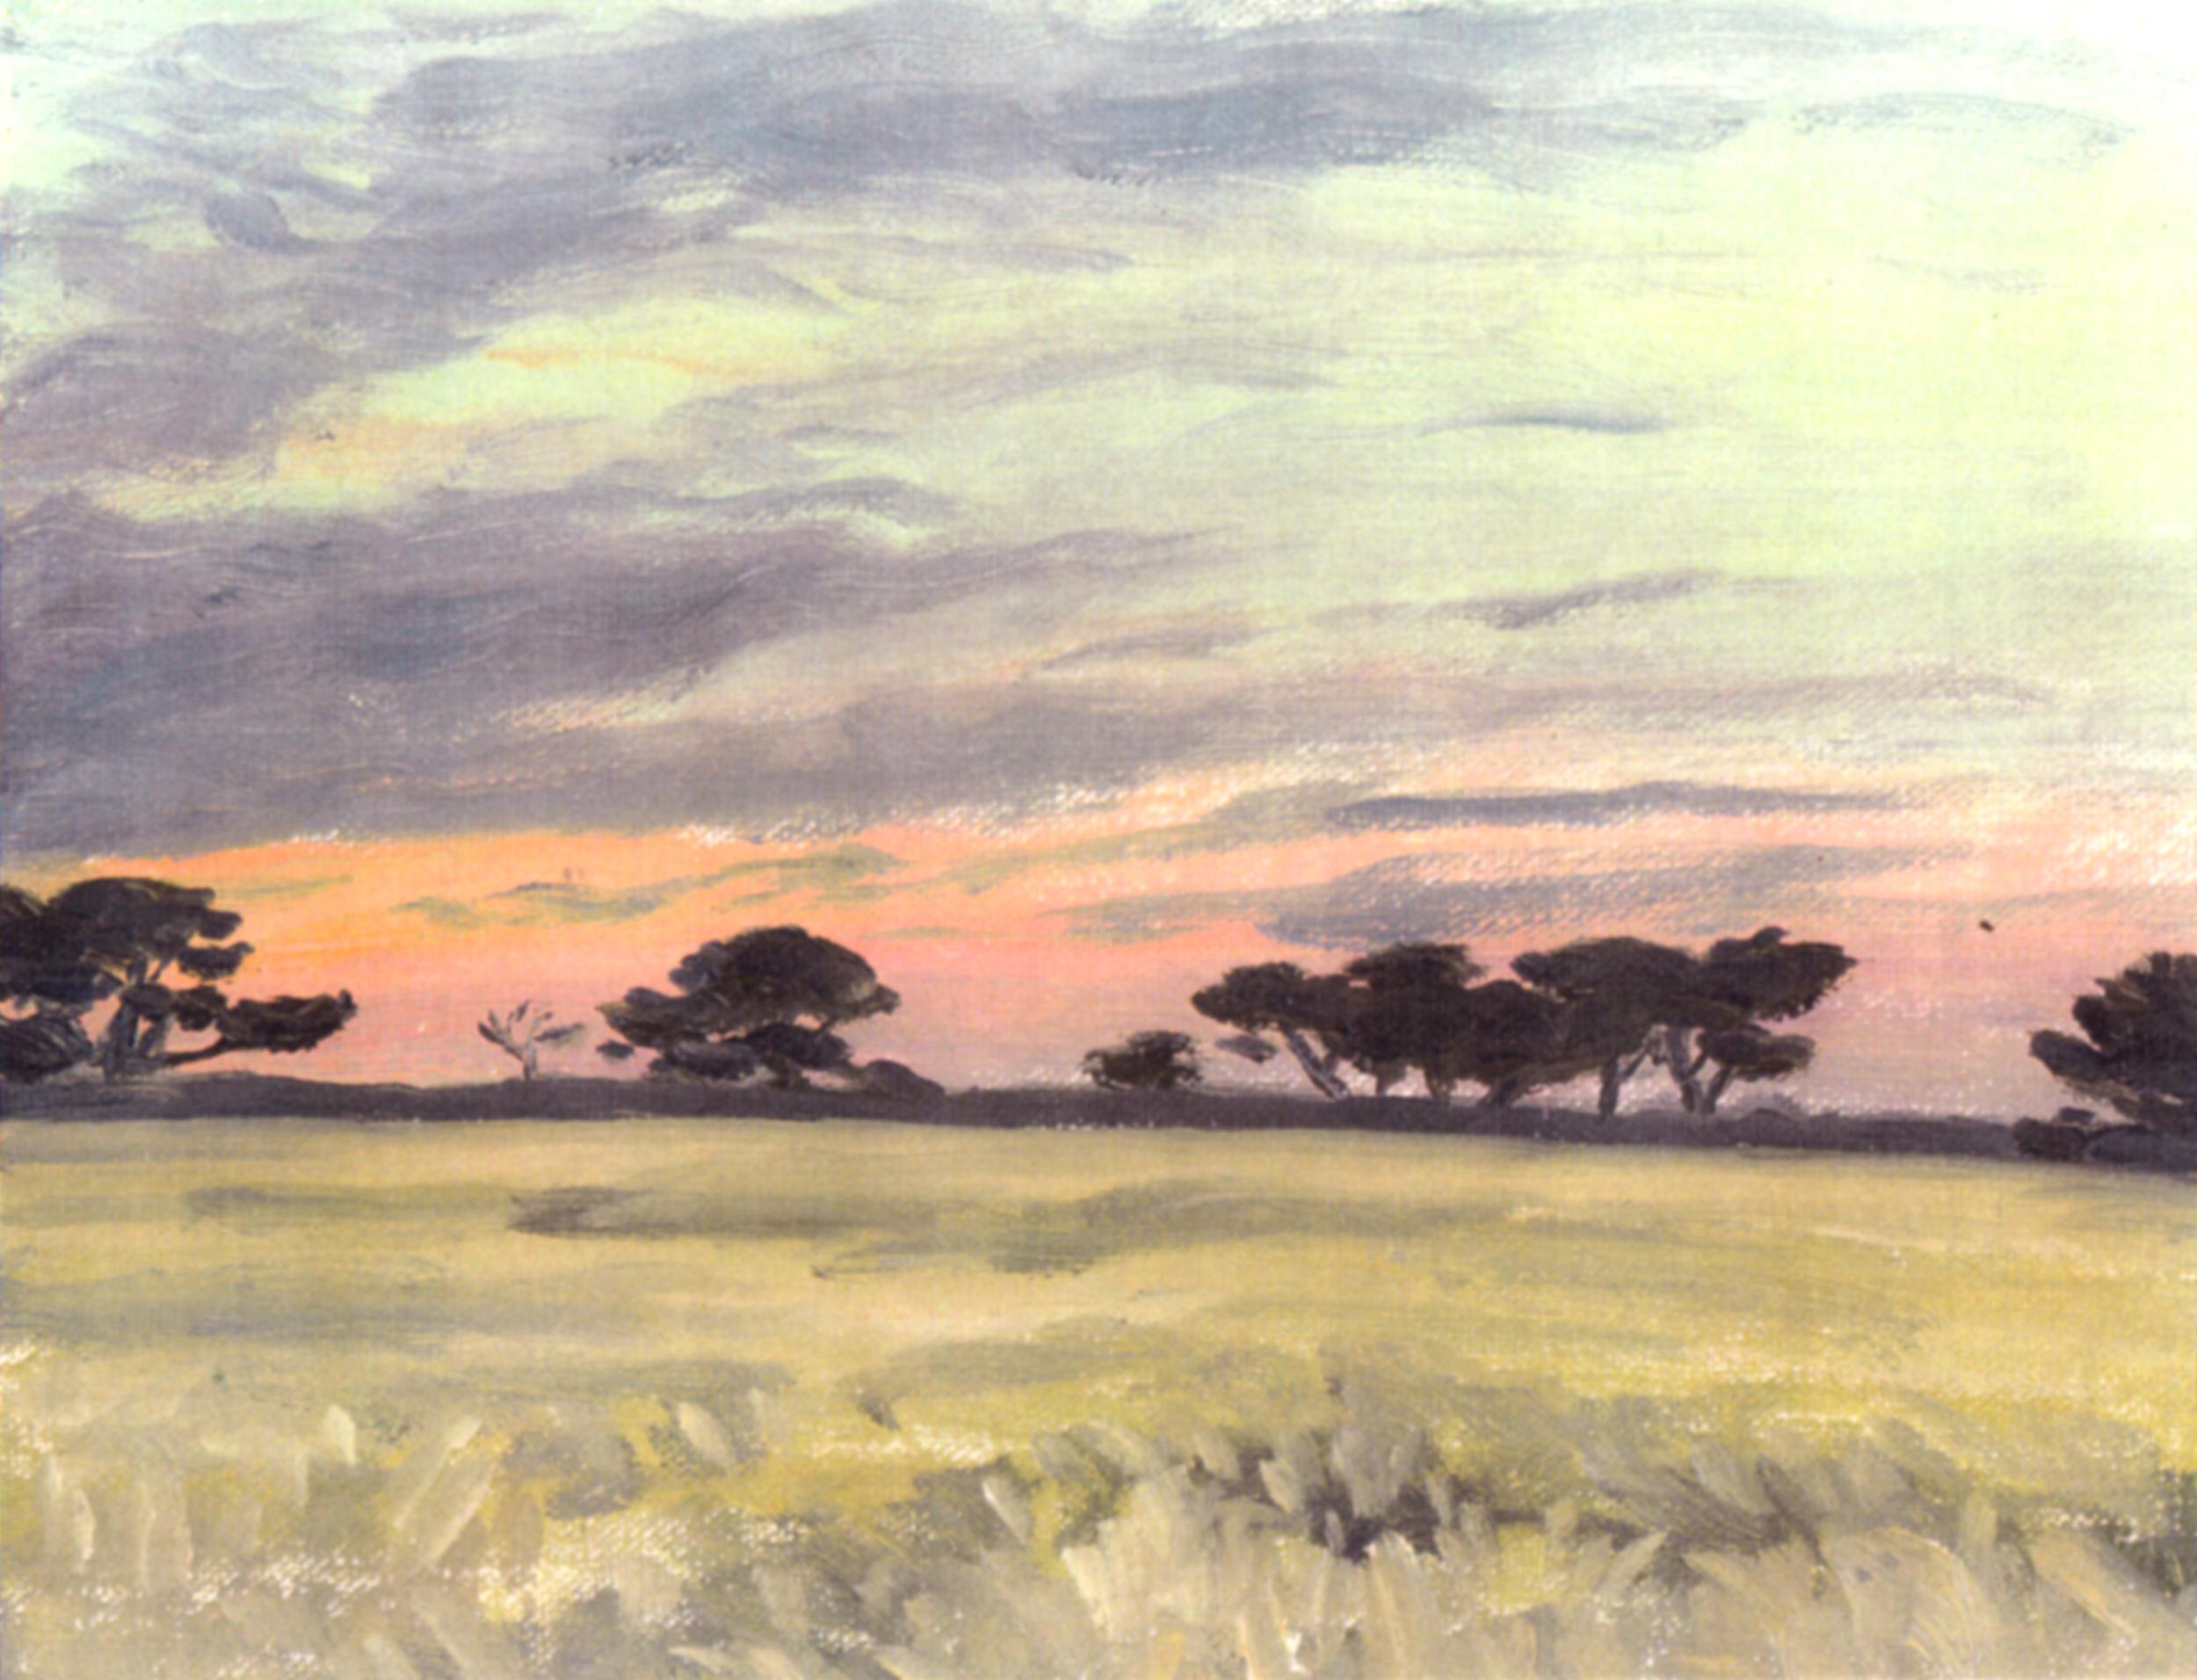 Monterey pines, Paul